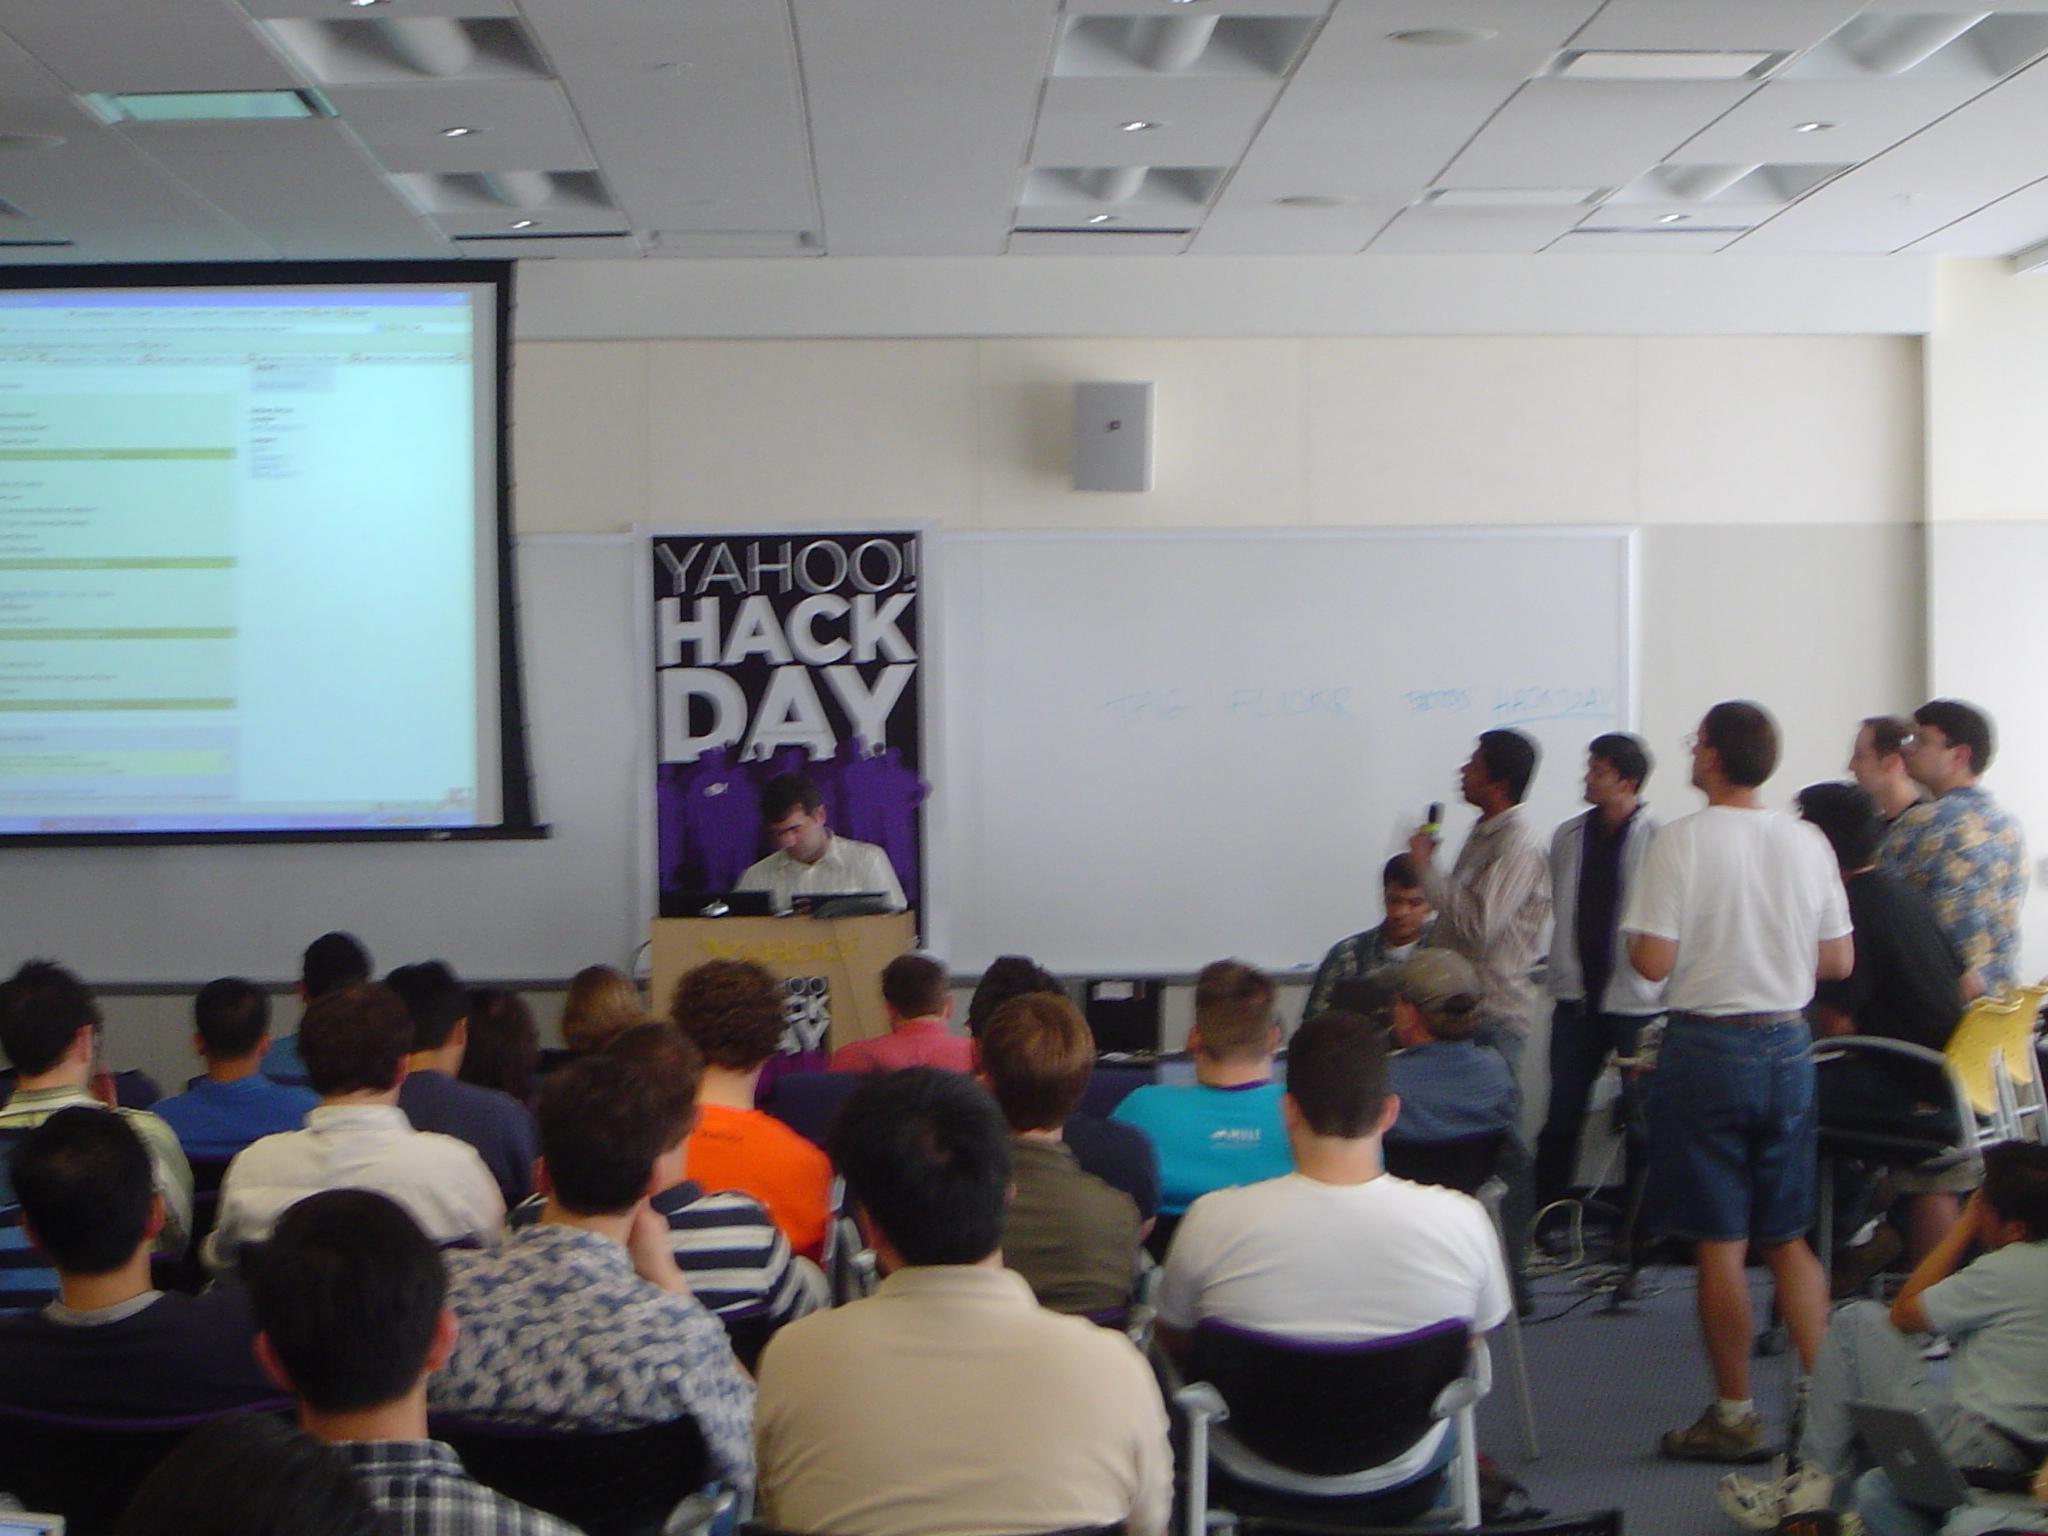 Yahoo! Internal Hack Day Event at Yahoo HQ (Sunnyvale, CA USA), June 6, 2006